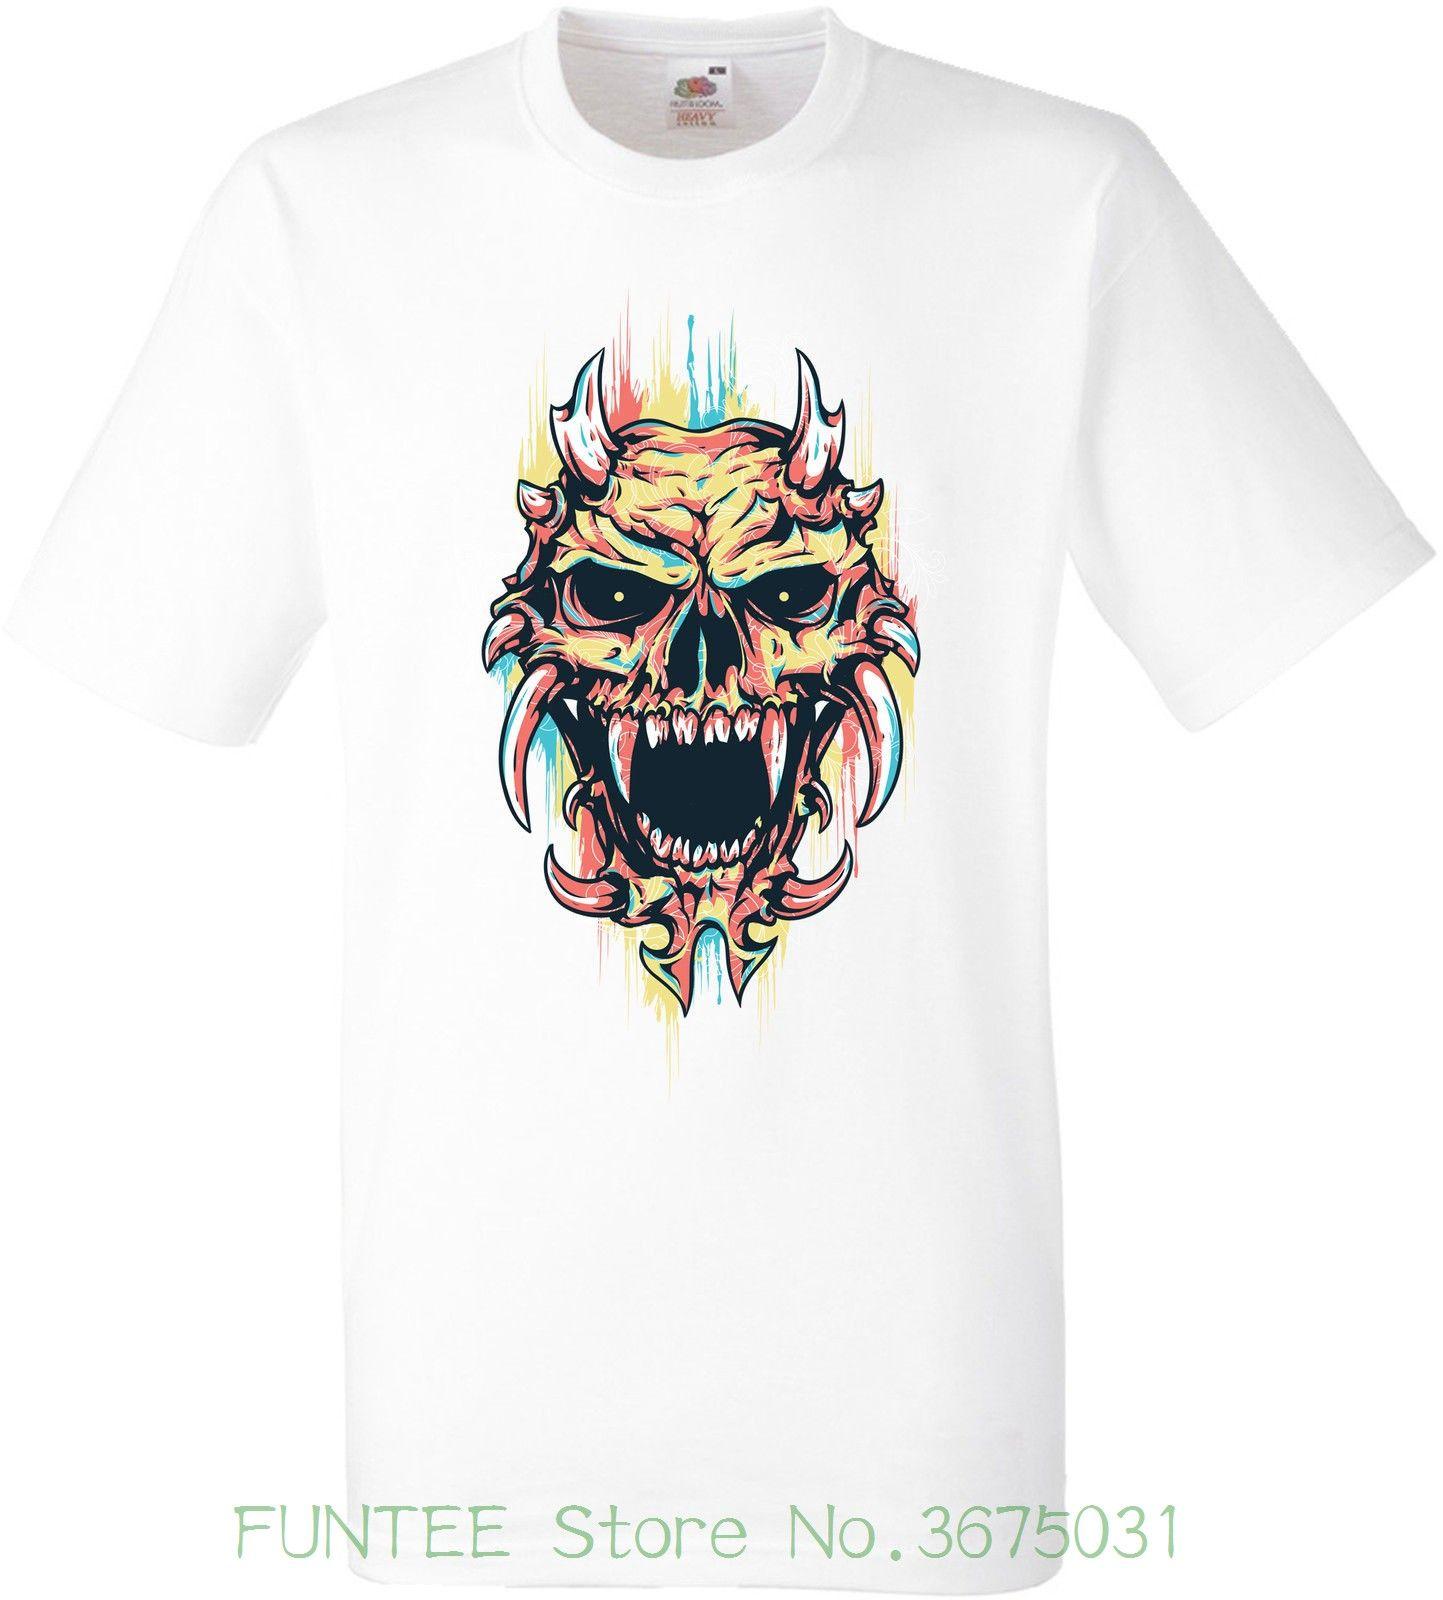 Women s Tee Skull Devil T.shirt 2018 Summer Style Women Short Sleeve ... c3a3746cec